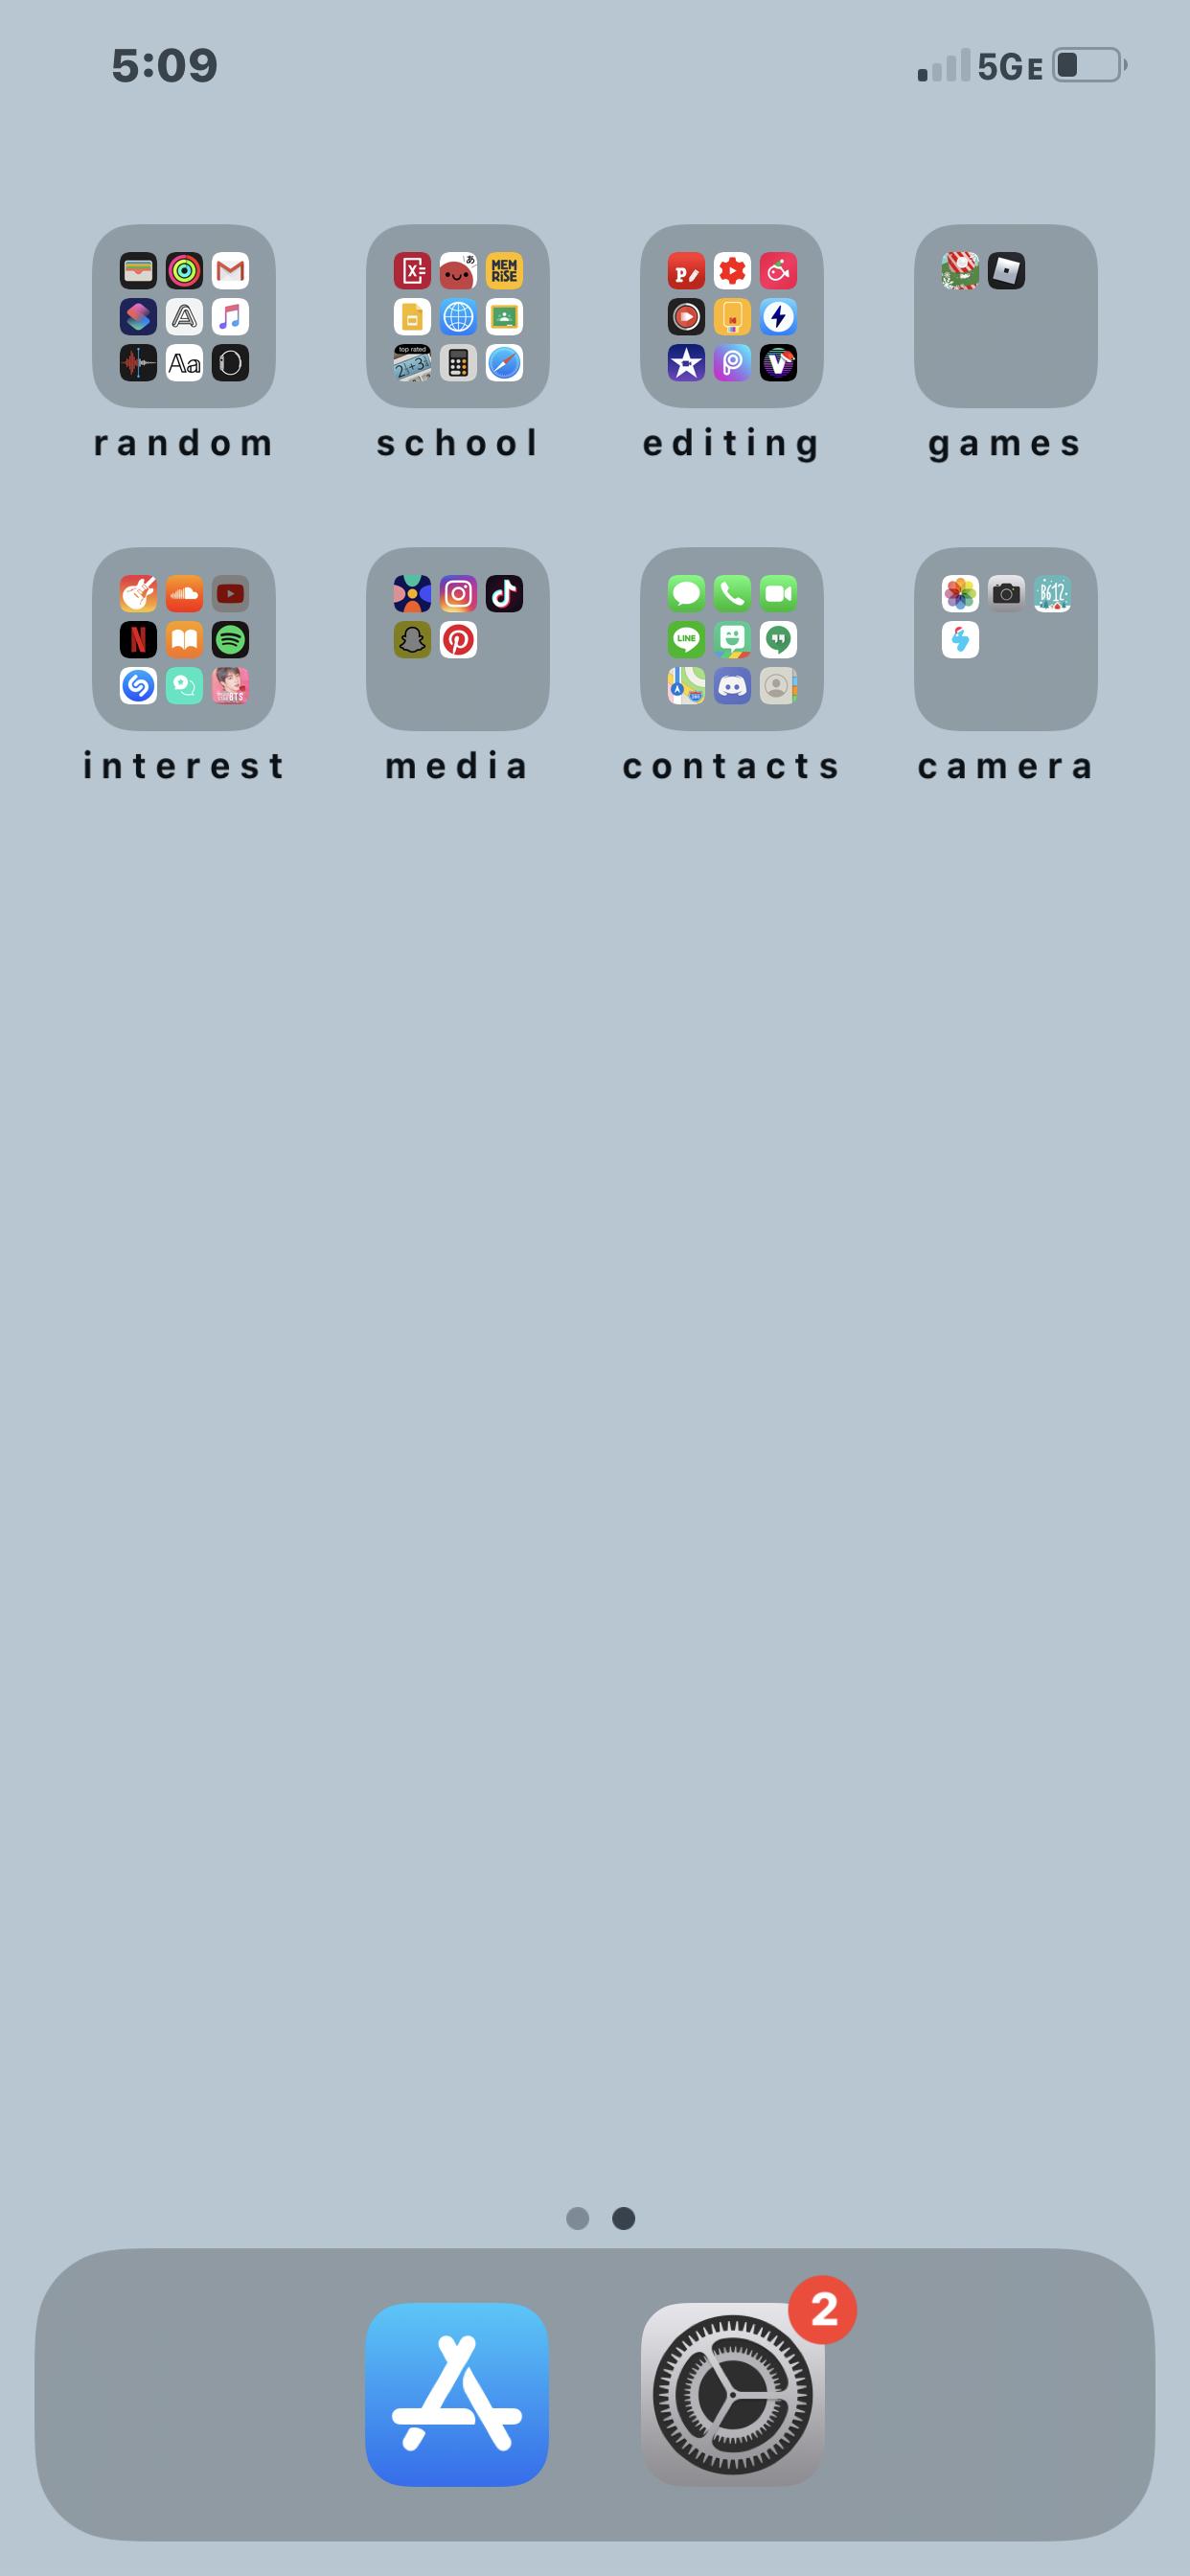 Simple Basic Phone Organization Iphone Organization Phone Organization Organize Phone Apps